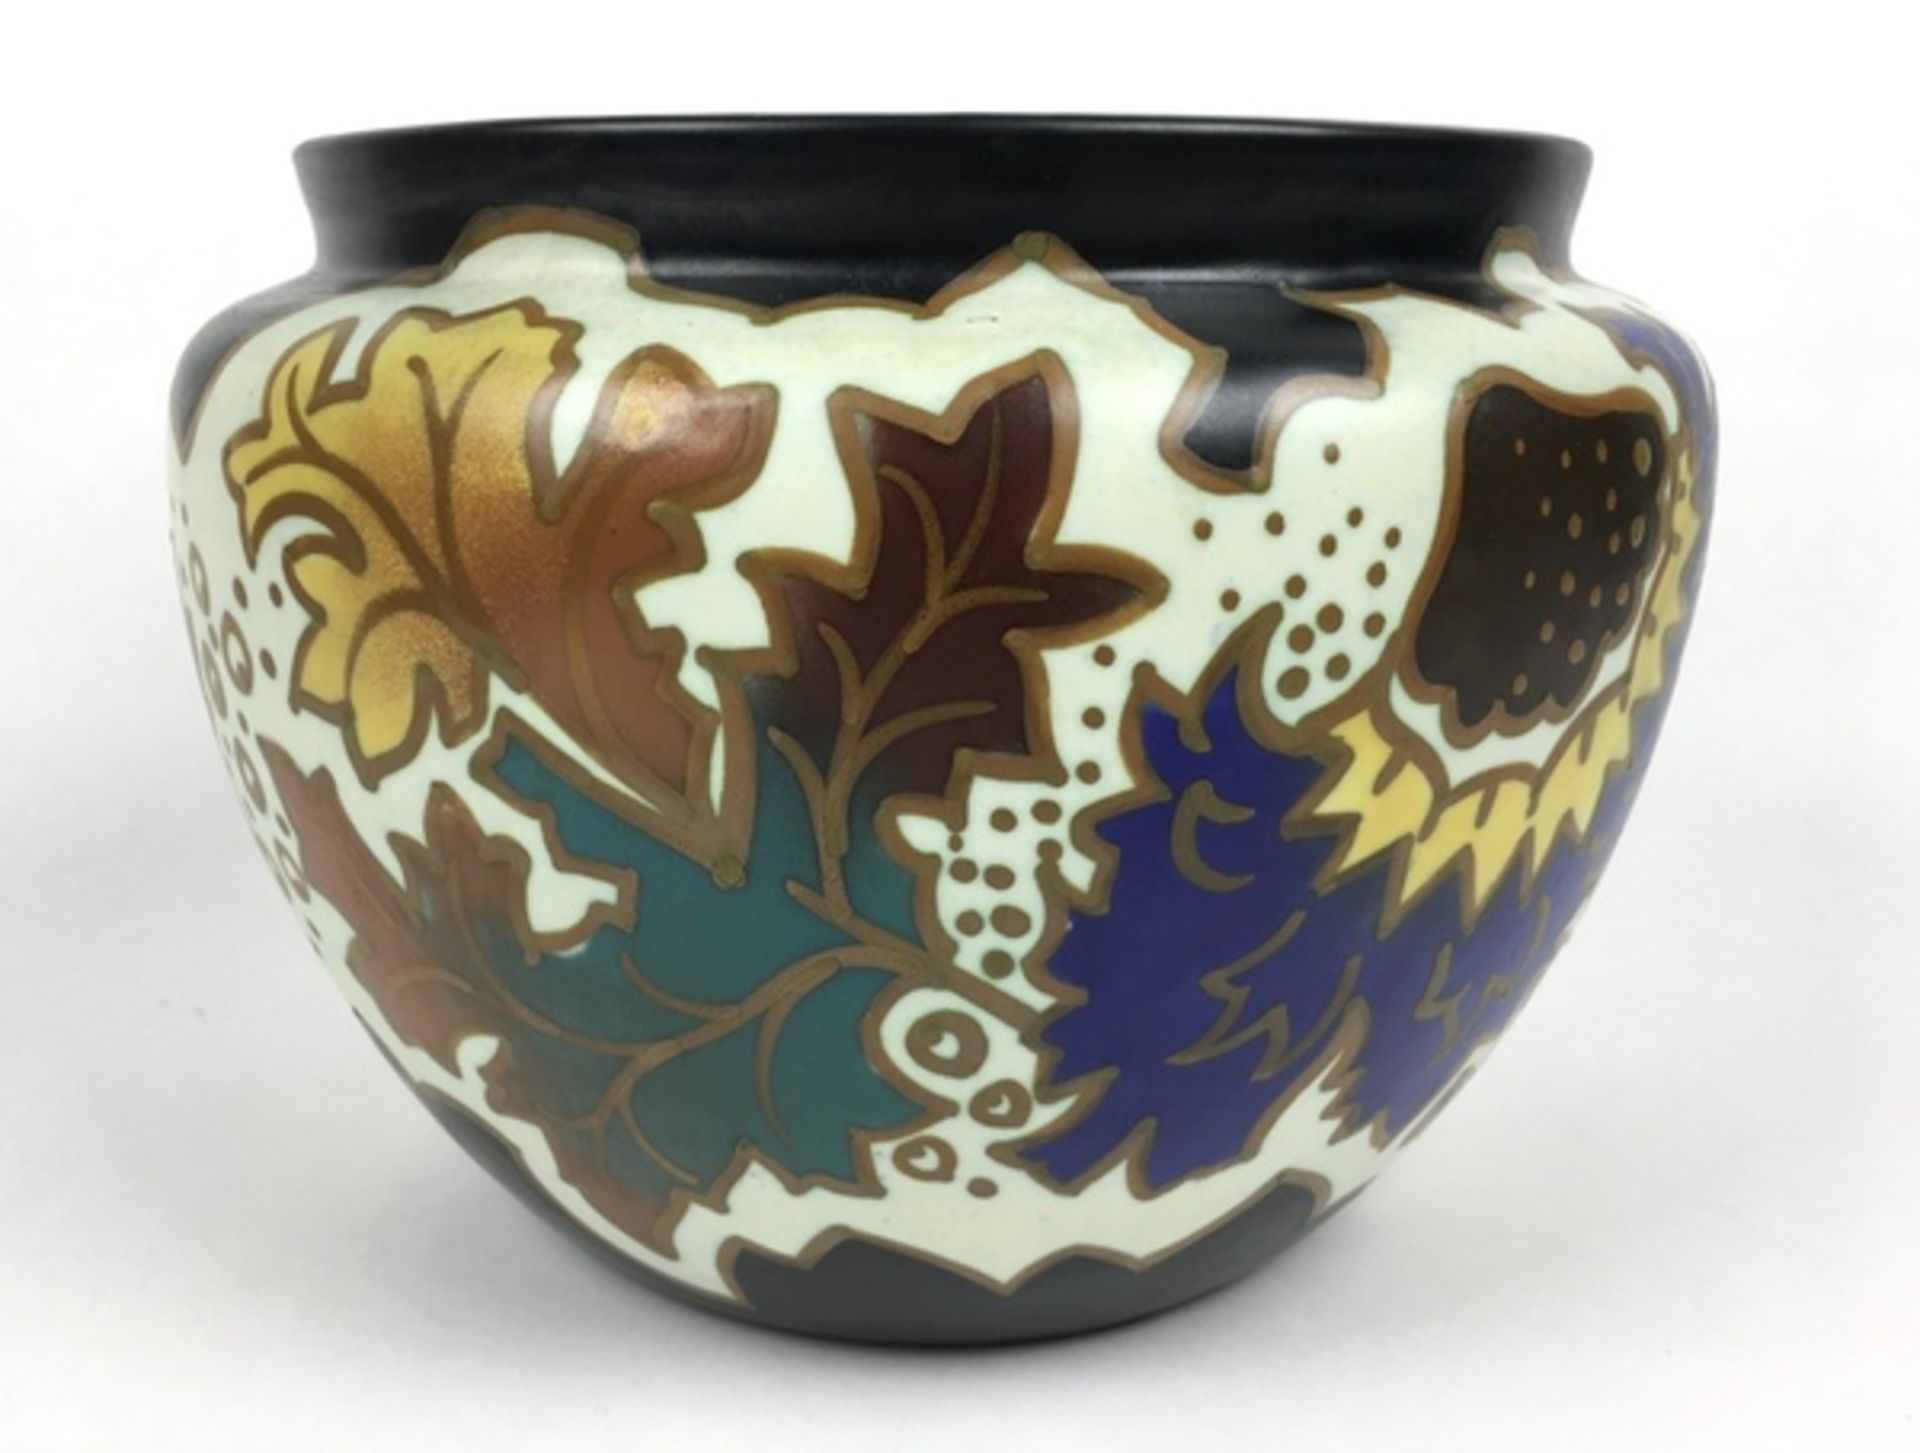 (Toegepaste Kunst) Plateel bloempot, ArnhemPlateel bloempot, Arnhem Holland B.V. Midden 20e eeu